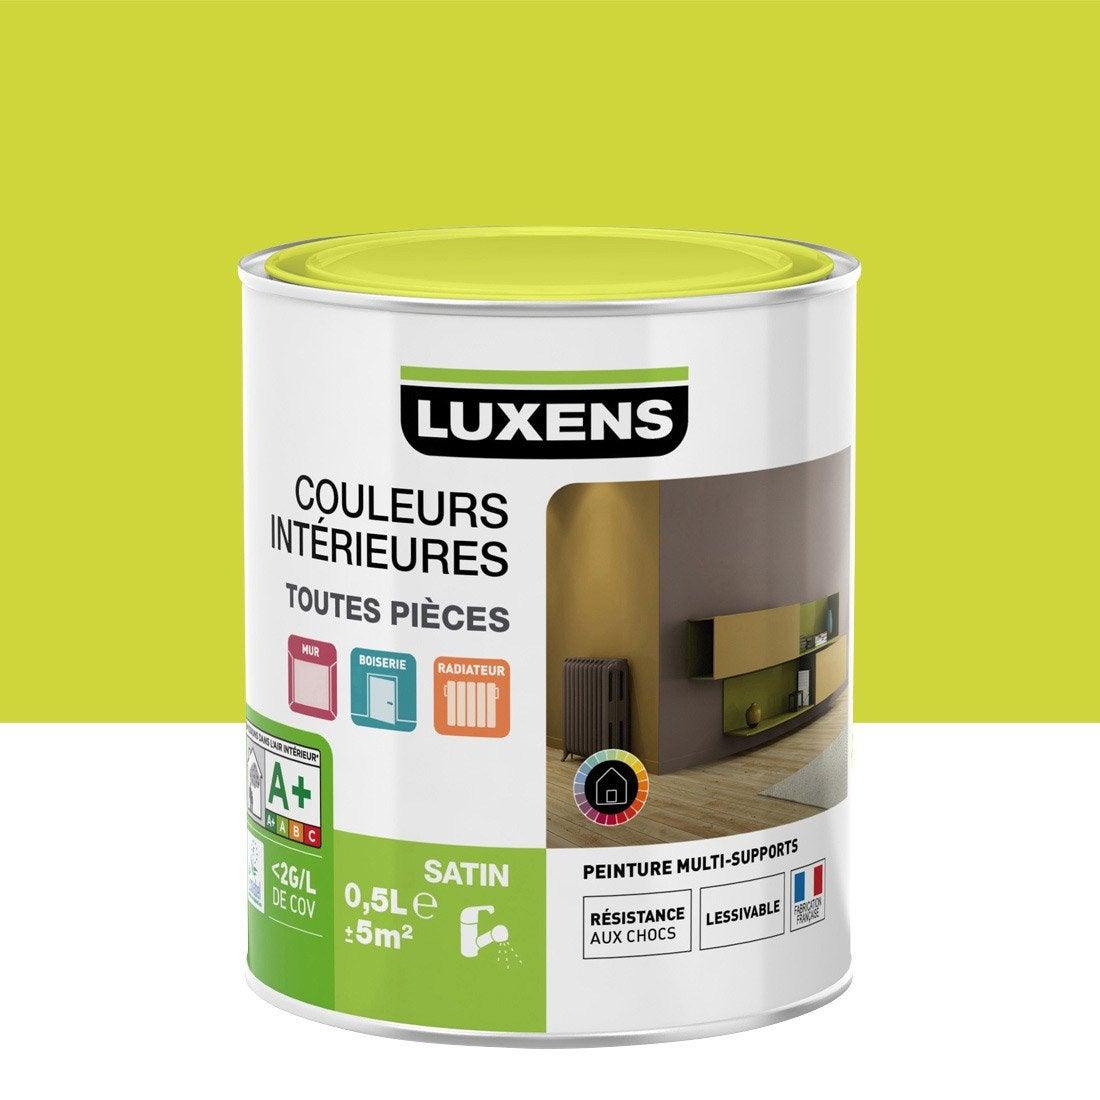 Peinture Jaune Anis 3 Satin Luxens Couleurs Int Rieures Satin 0 5 L